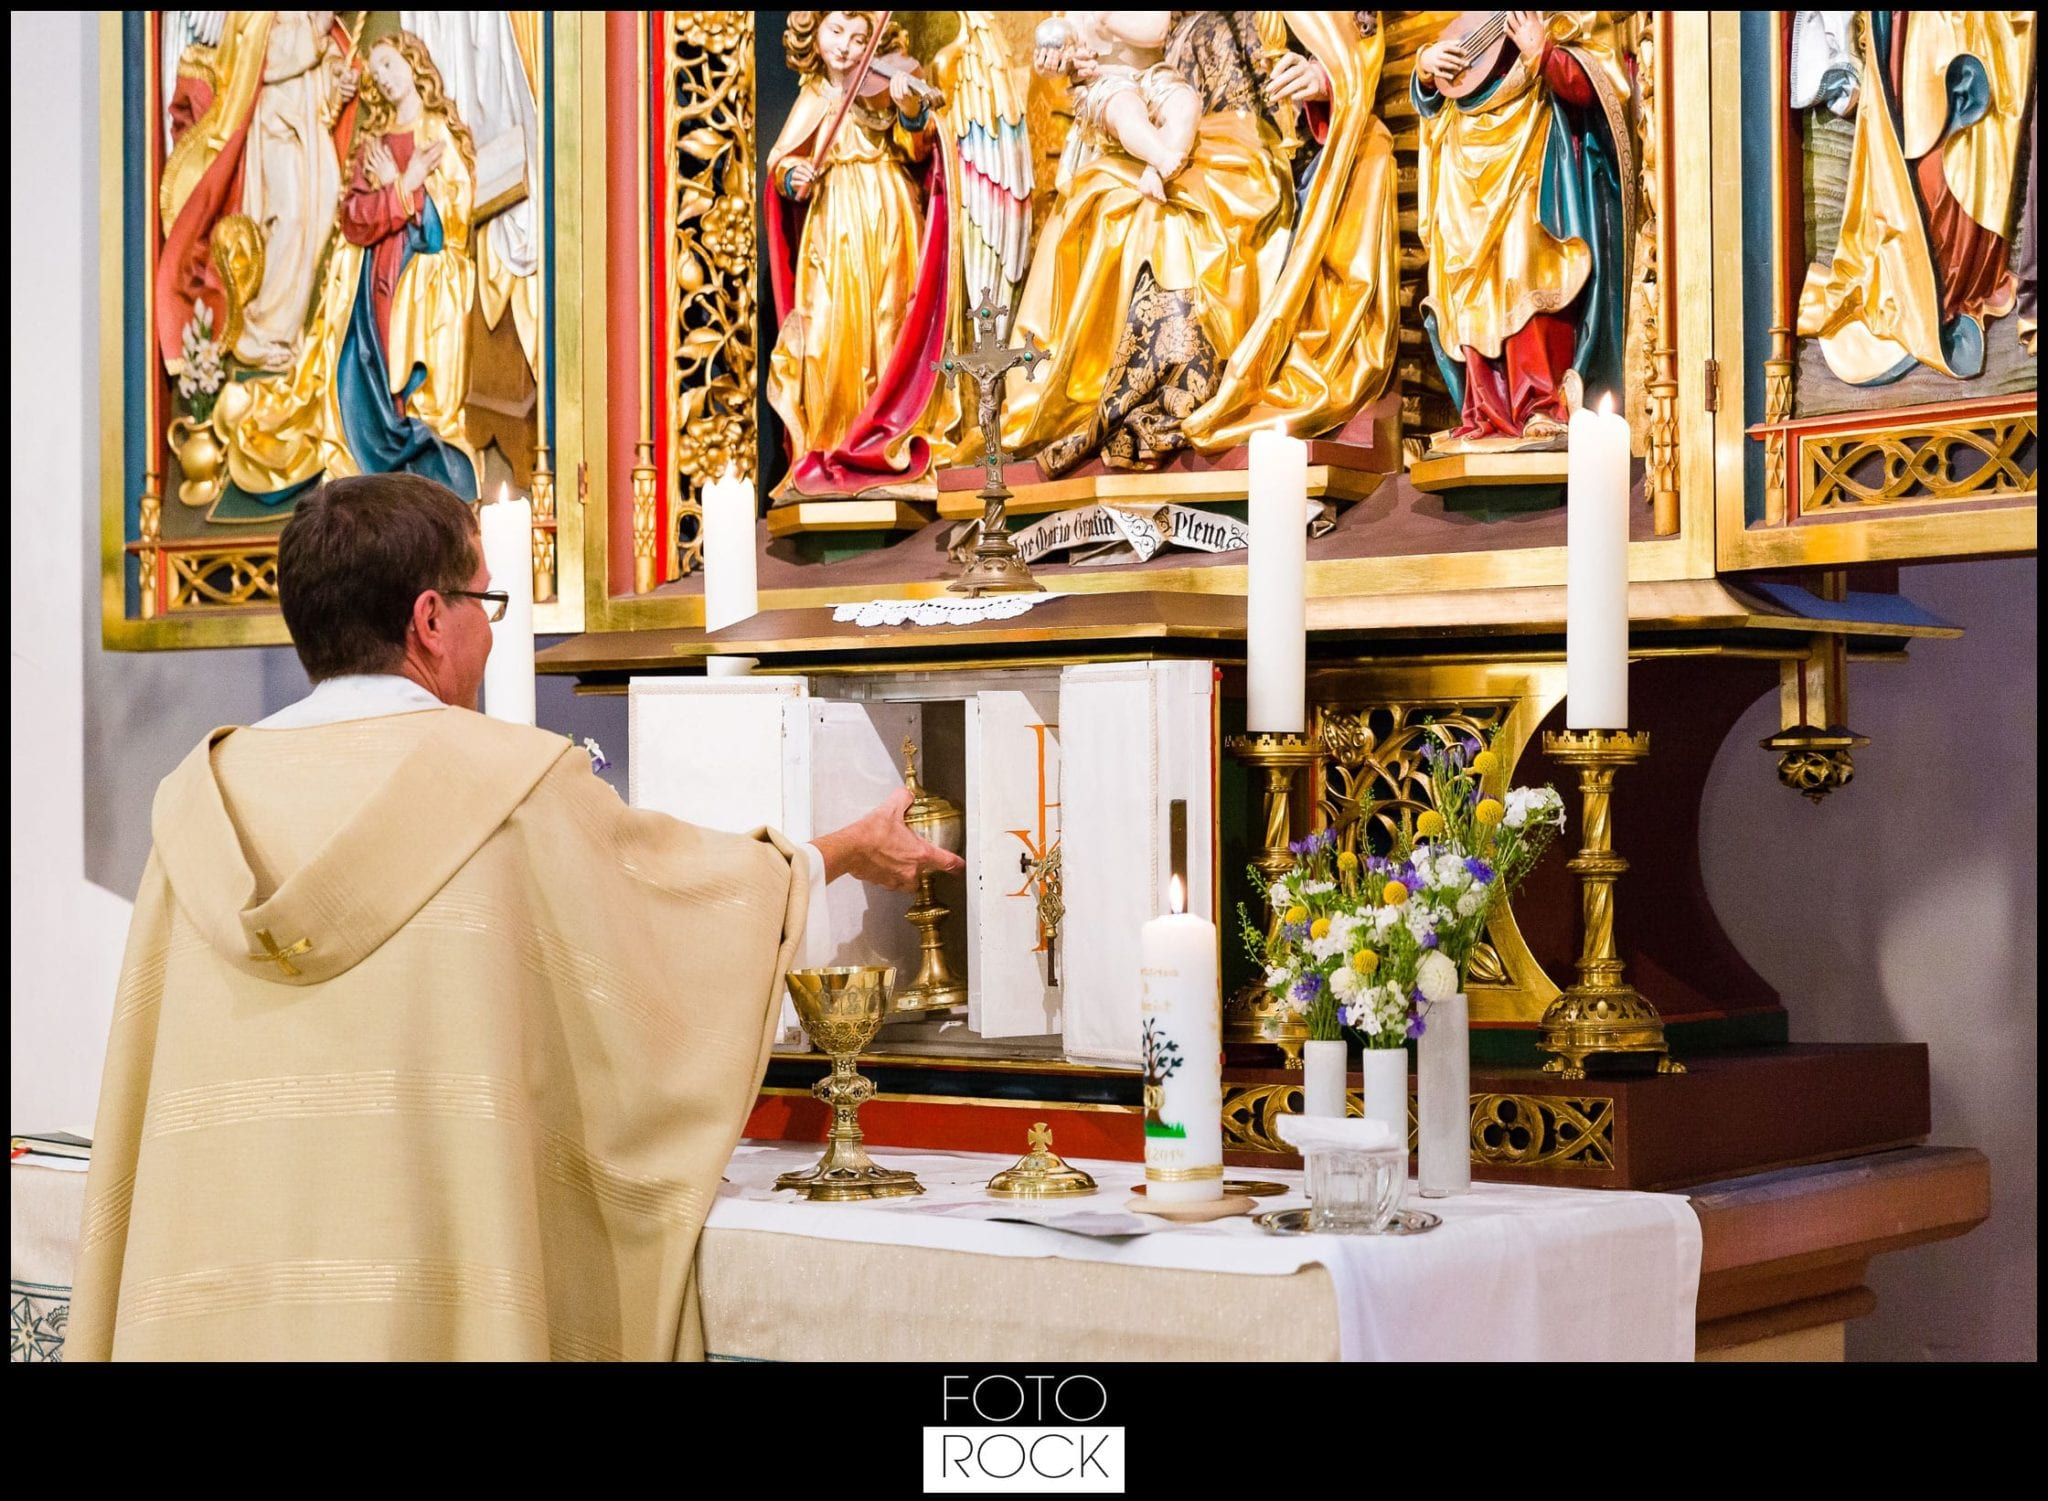 Hochzeit Elzach kapelle triptychon pfarrer kerze